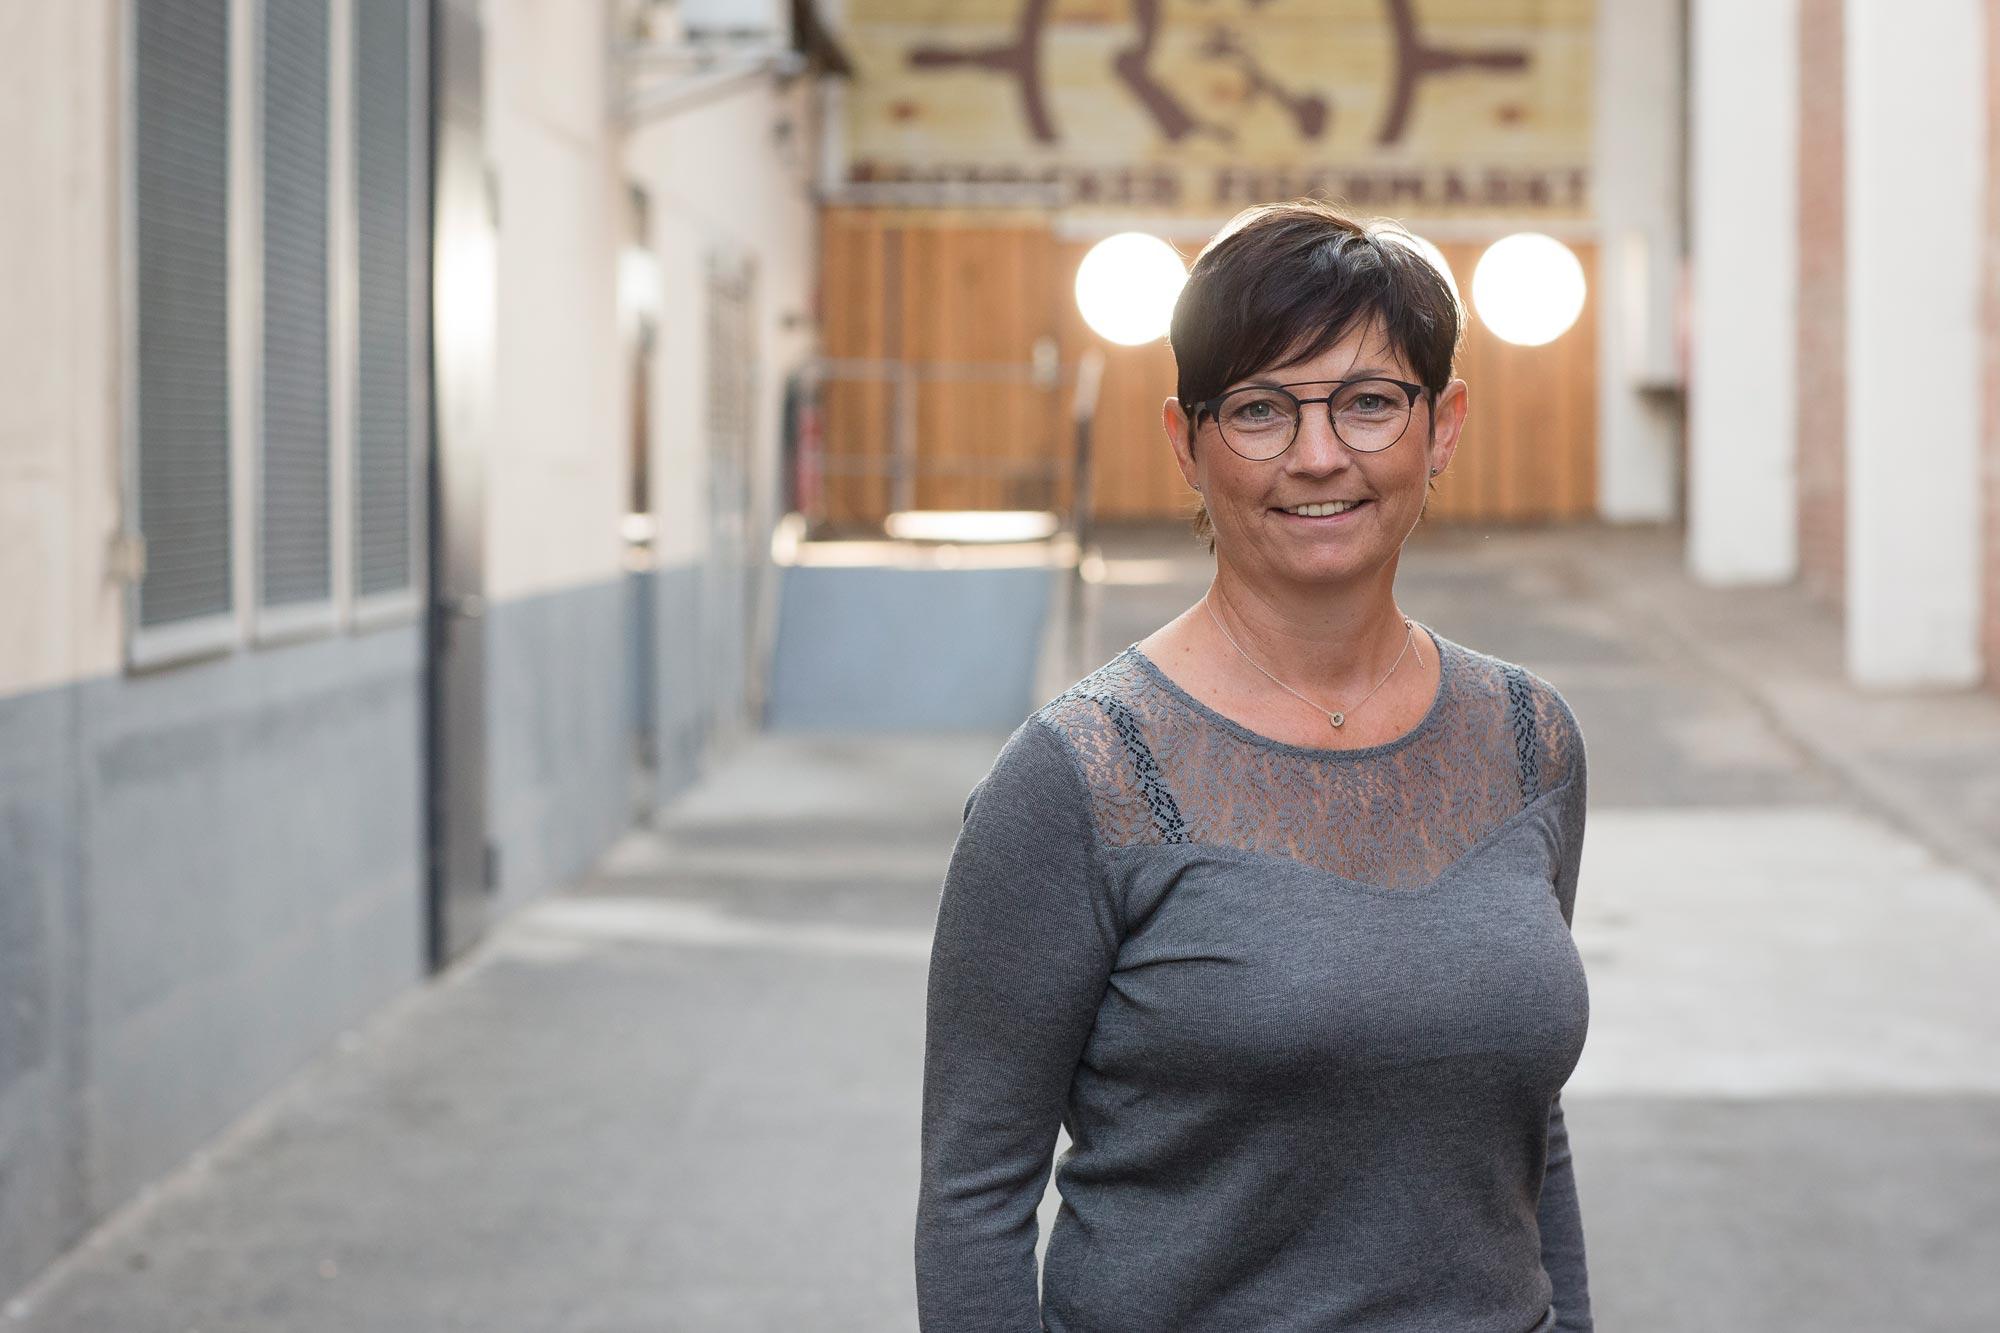 Sibylle Weinaug ist Augenoptikermeisterin bei Optik Sagawe im Doberaner Hof